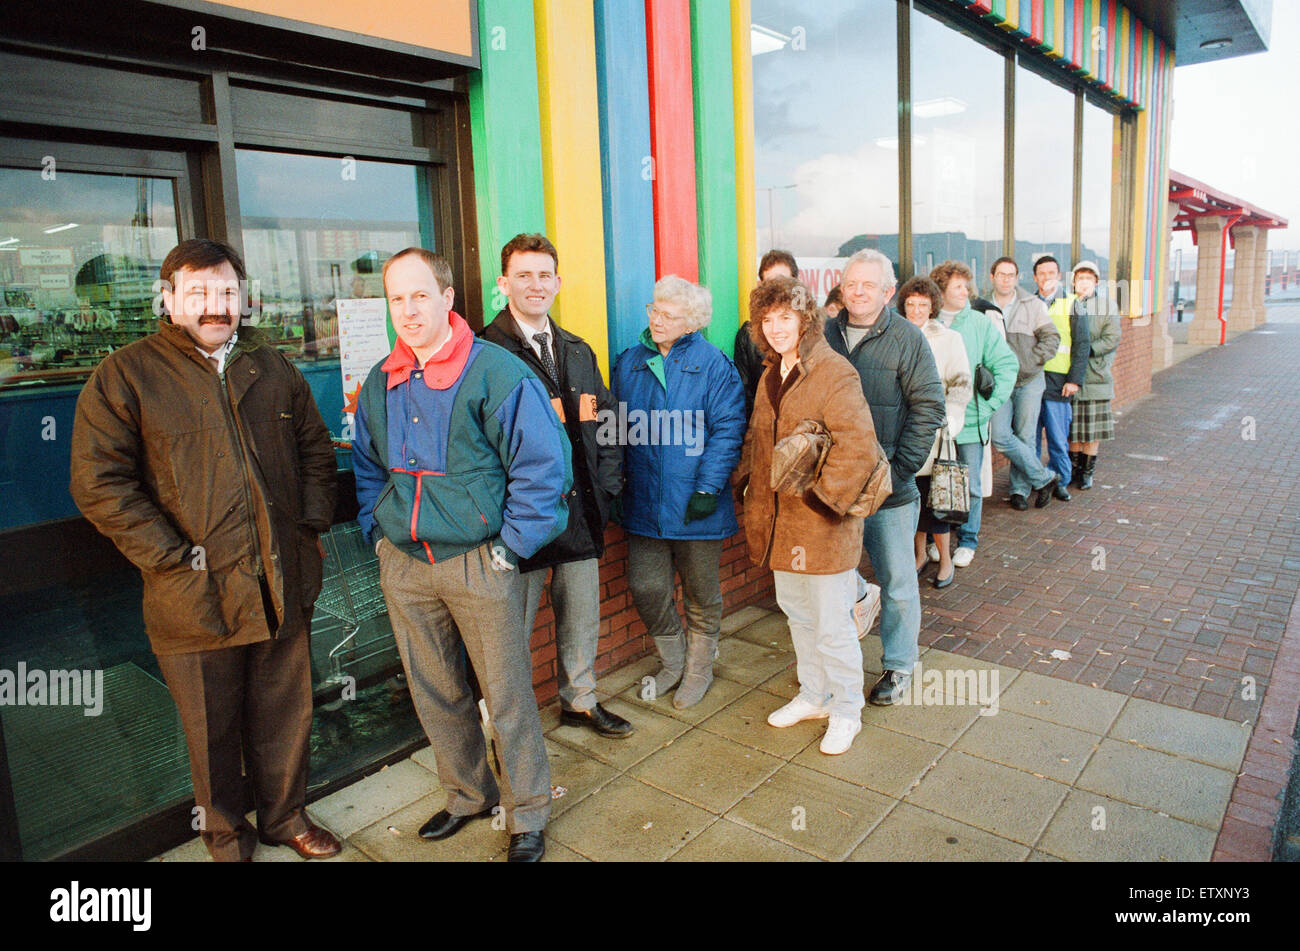 Early morning queues at Toys R Us at Teesside Shopping Park, Sandown Way, Stockton on Tees, 22nd November 1990. - Stock Image